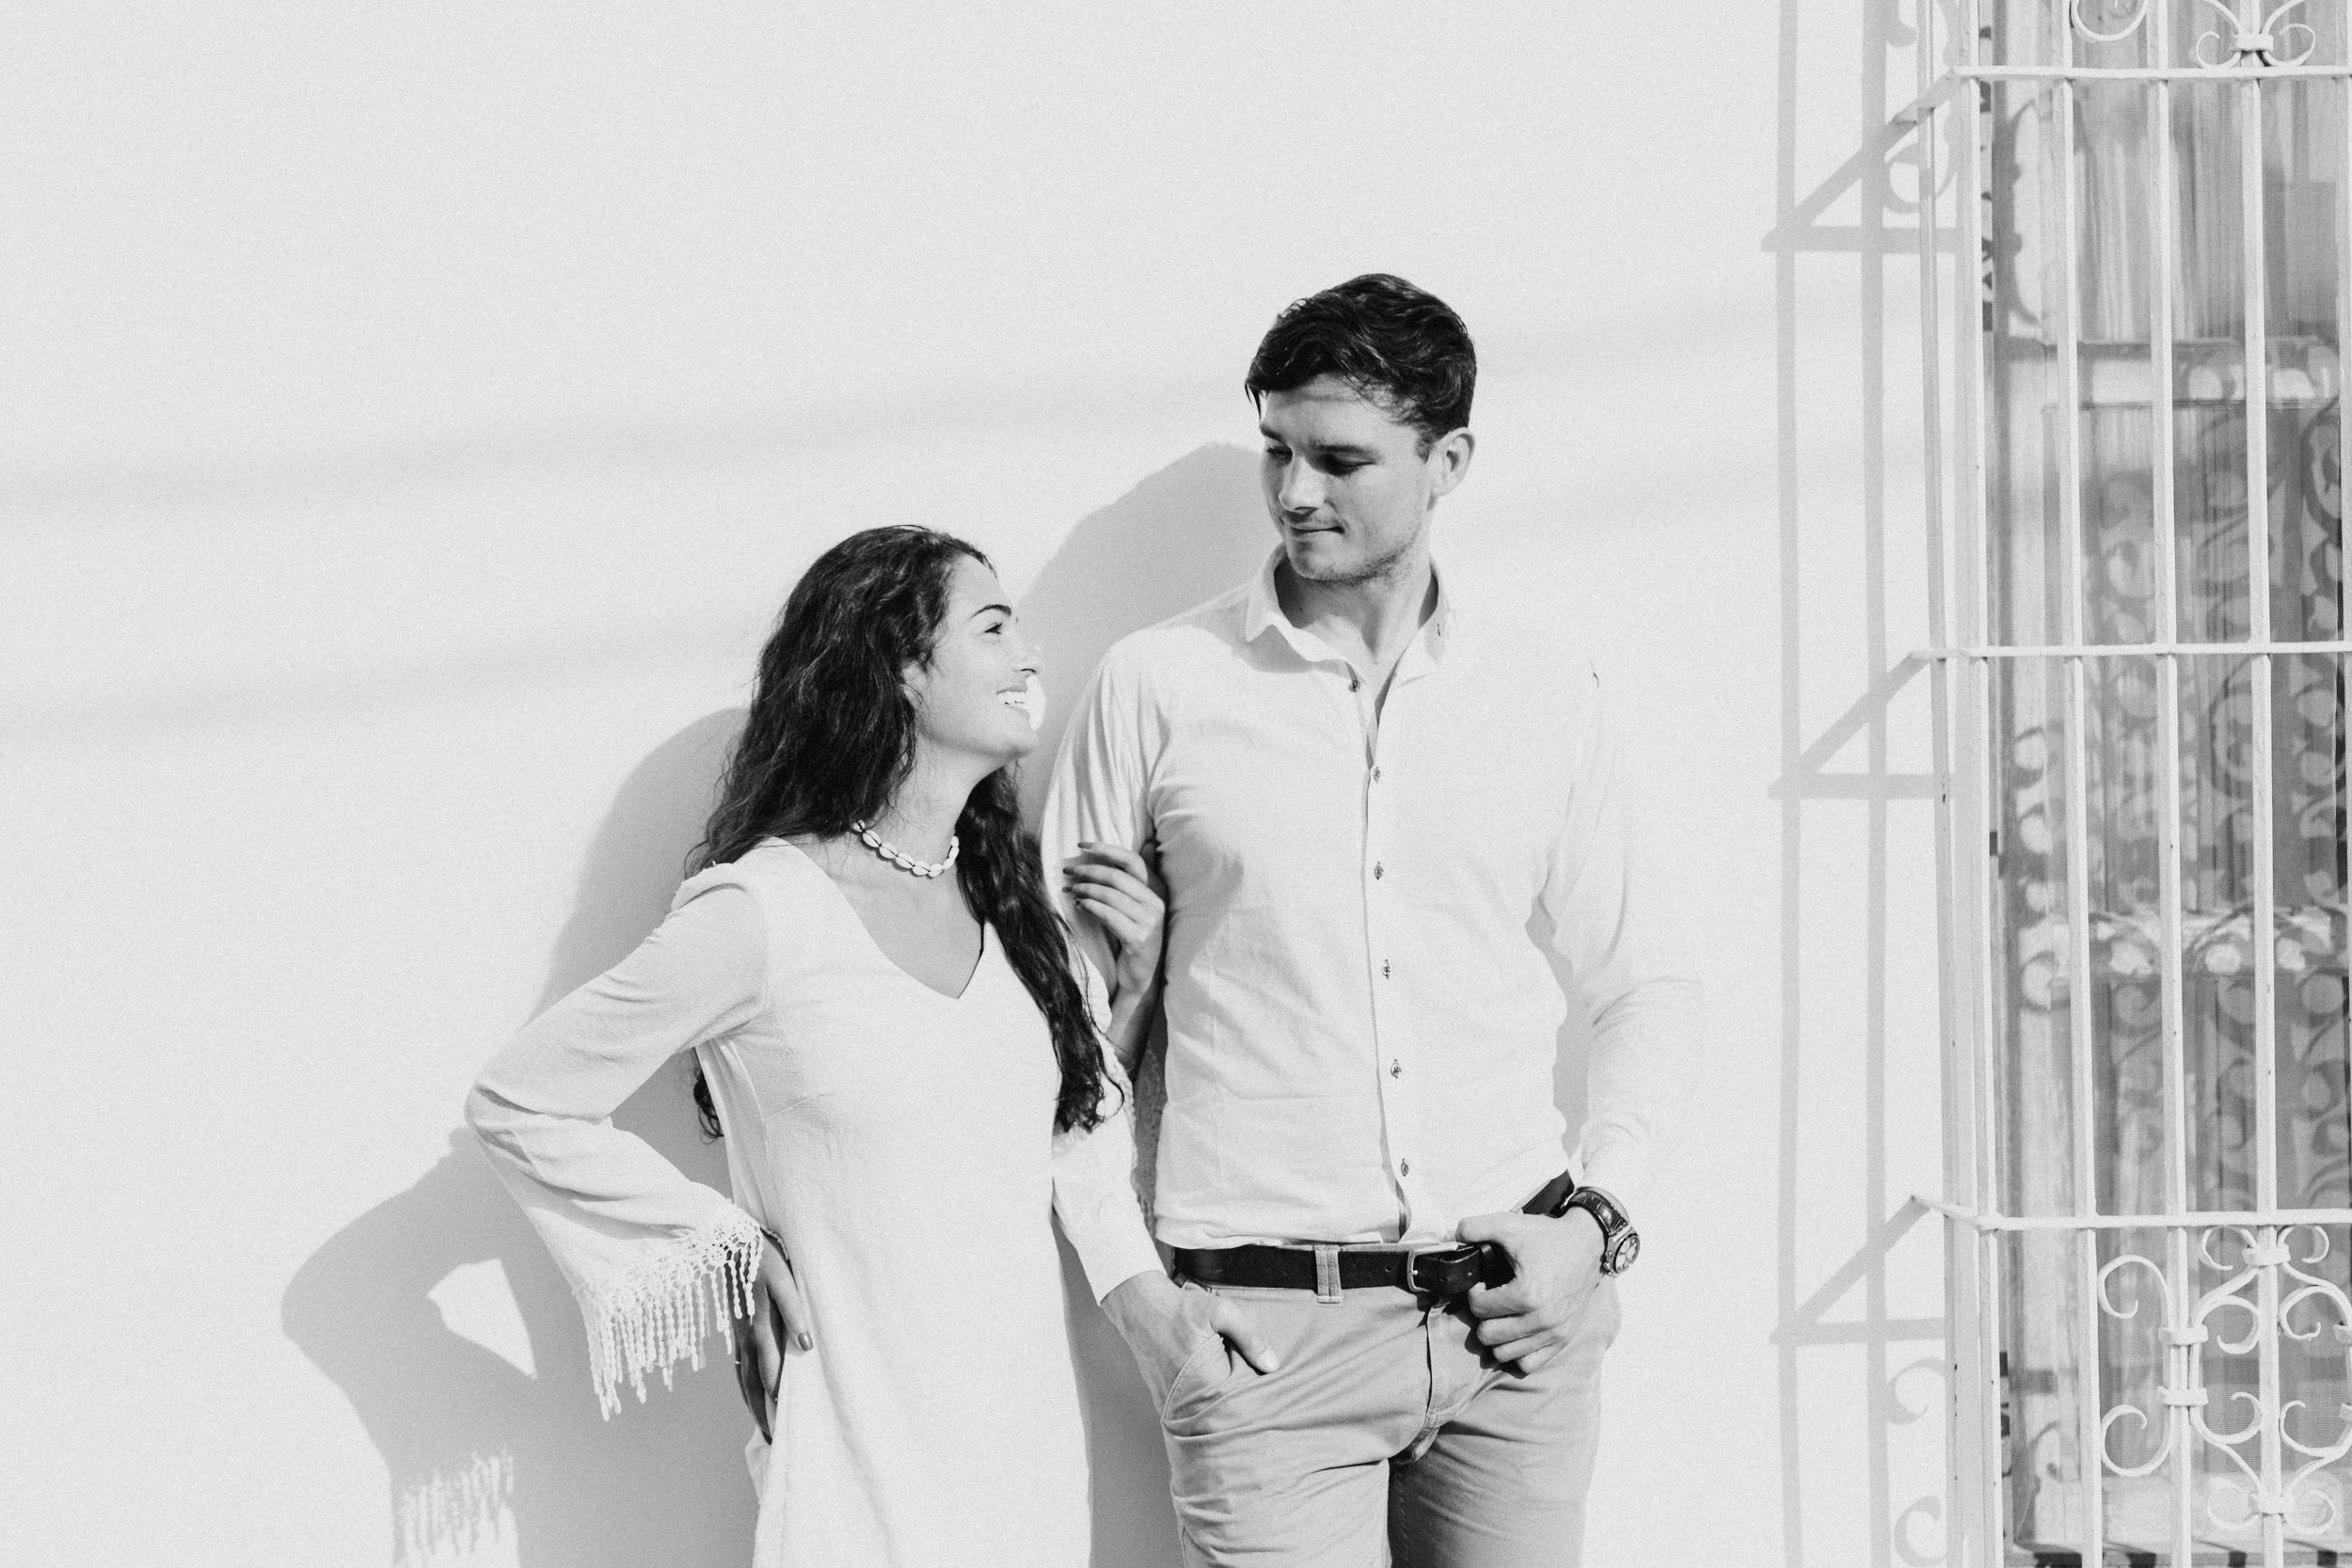 huacachina-peru-honeymoon-elopement-destination-wedding-photography-michael-cozzens-48.jpg